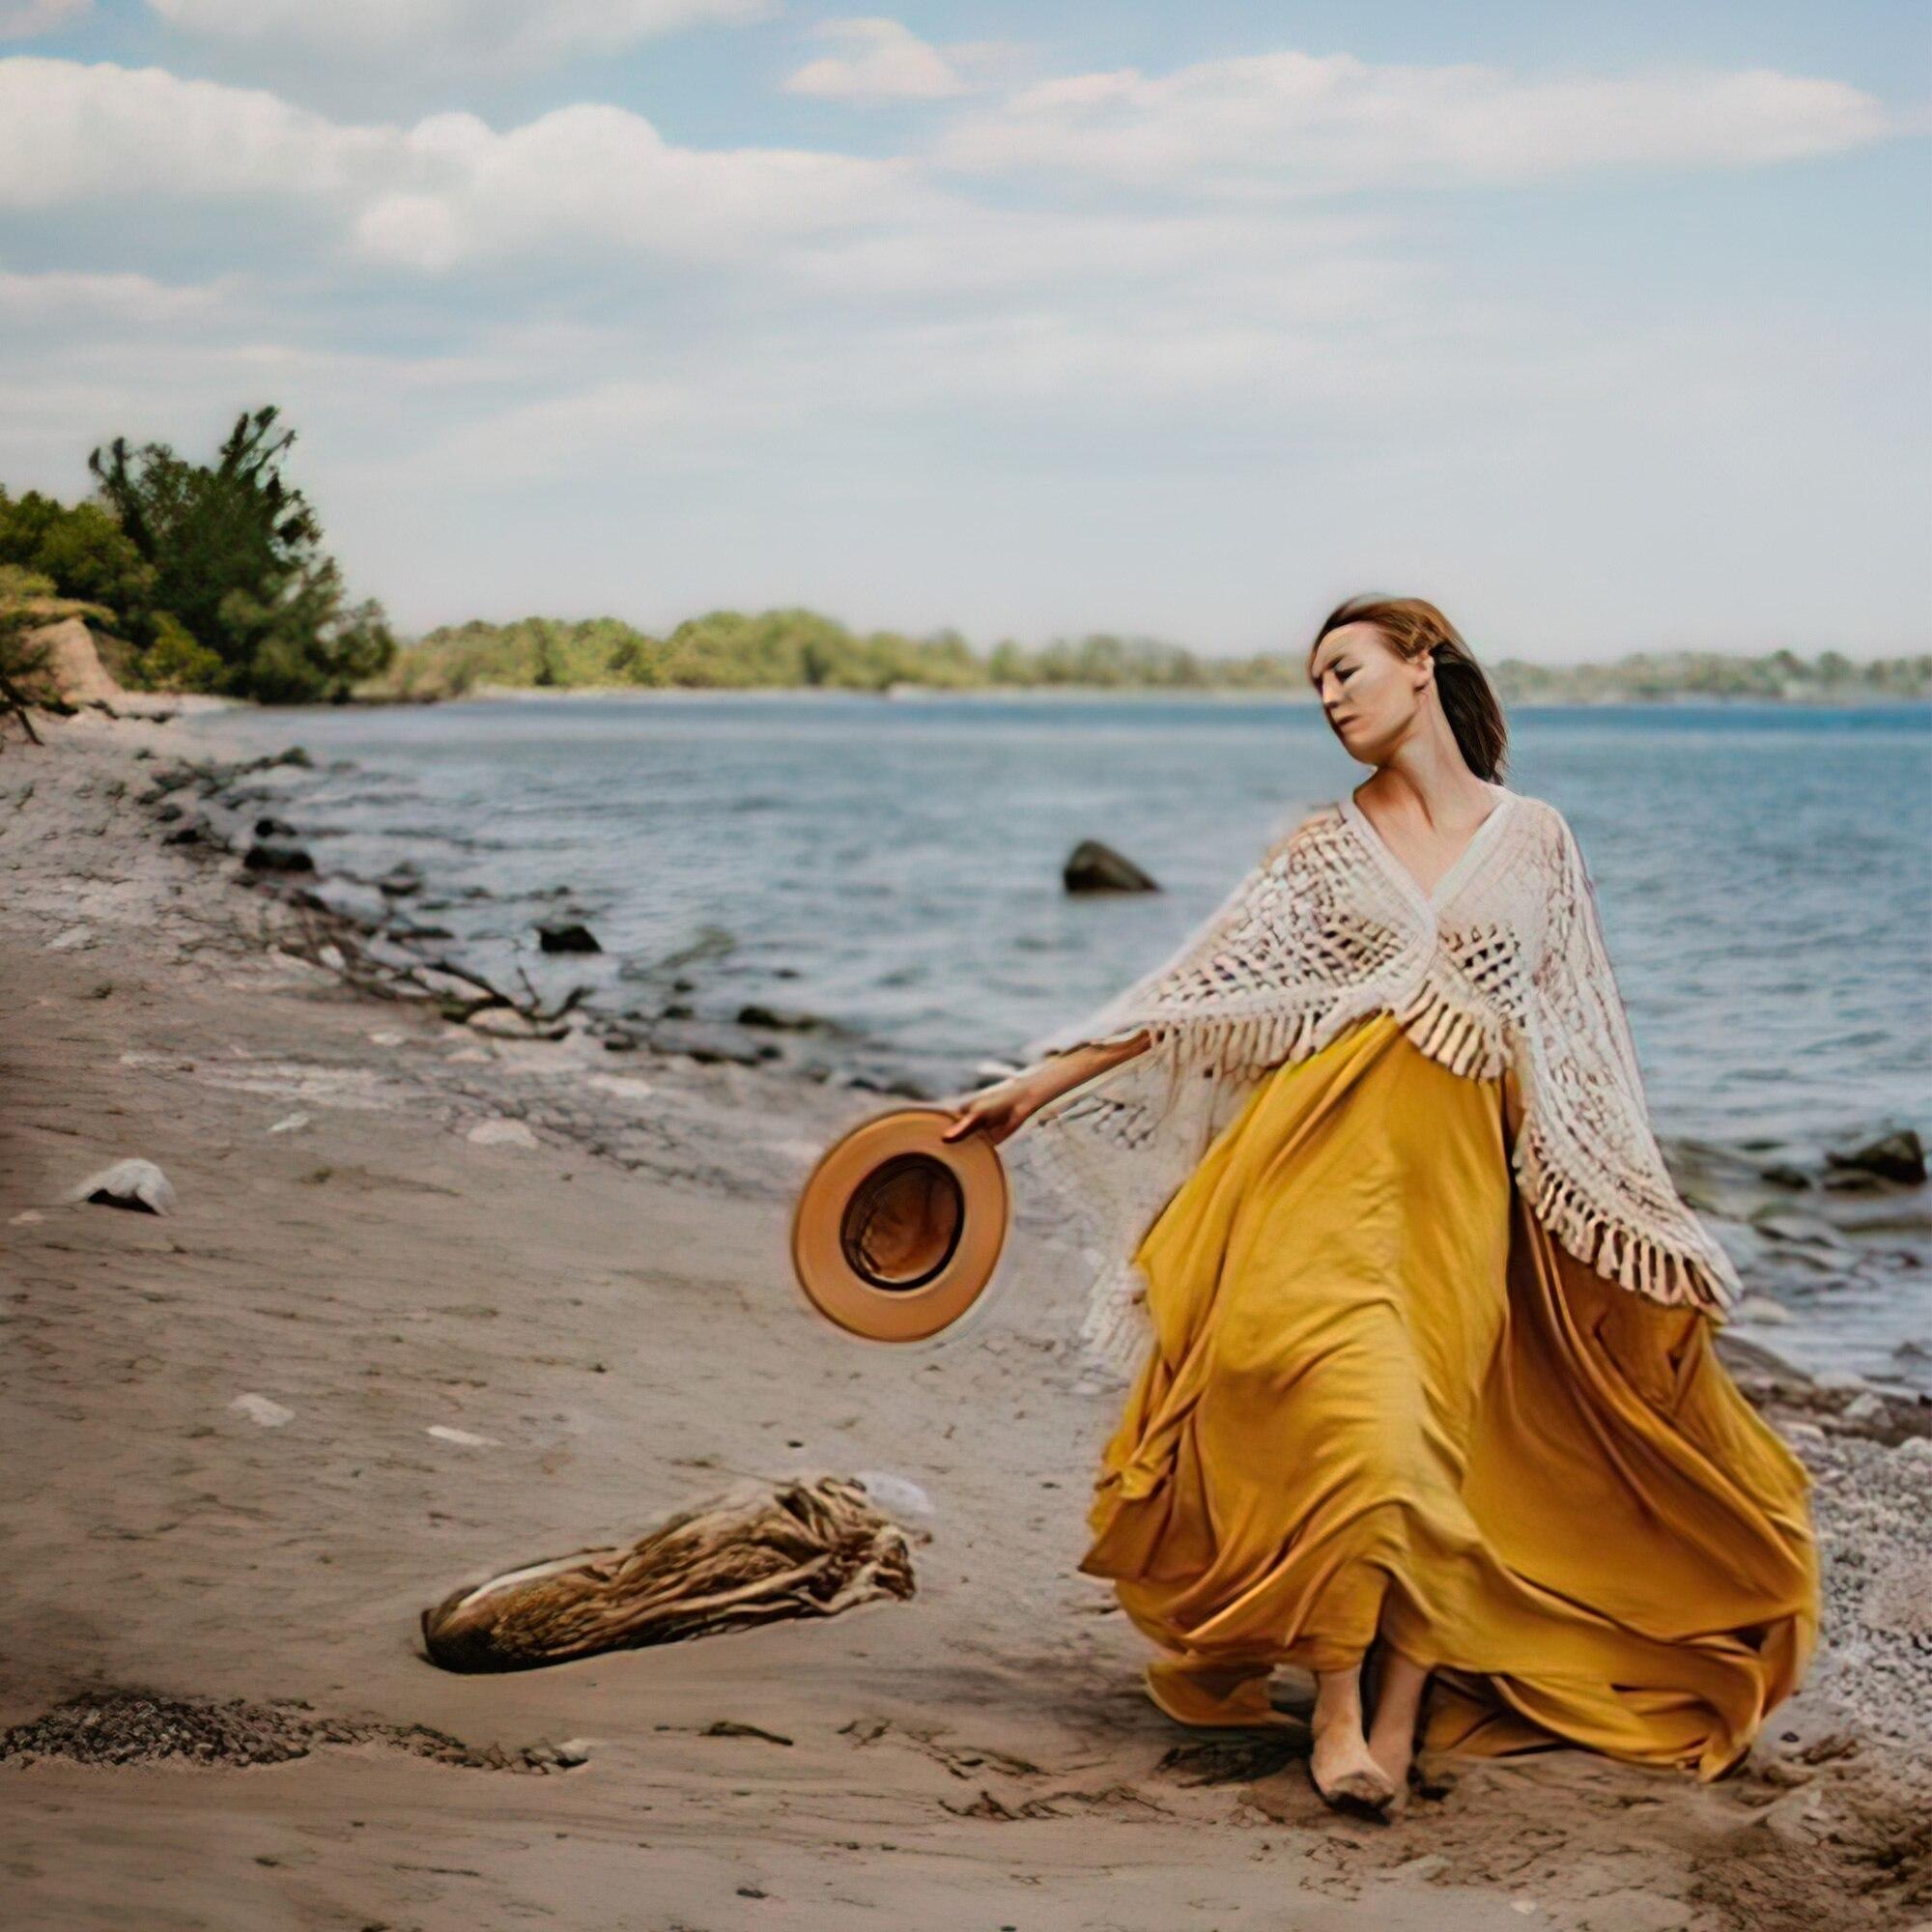 Photo Shoot Crochet Kaftan Boho Cotton Long Sleeves Robe Maternity Dress Evening Party Costume Women Photography Accessories enlarge